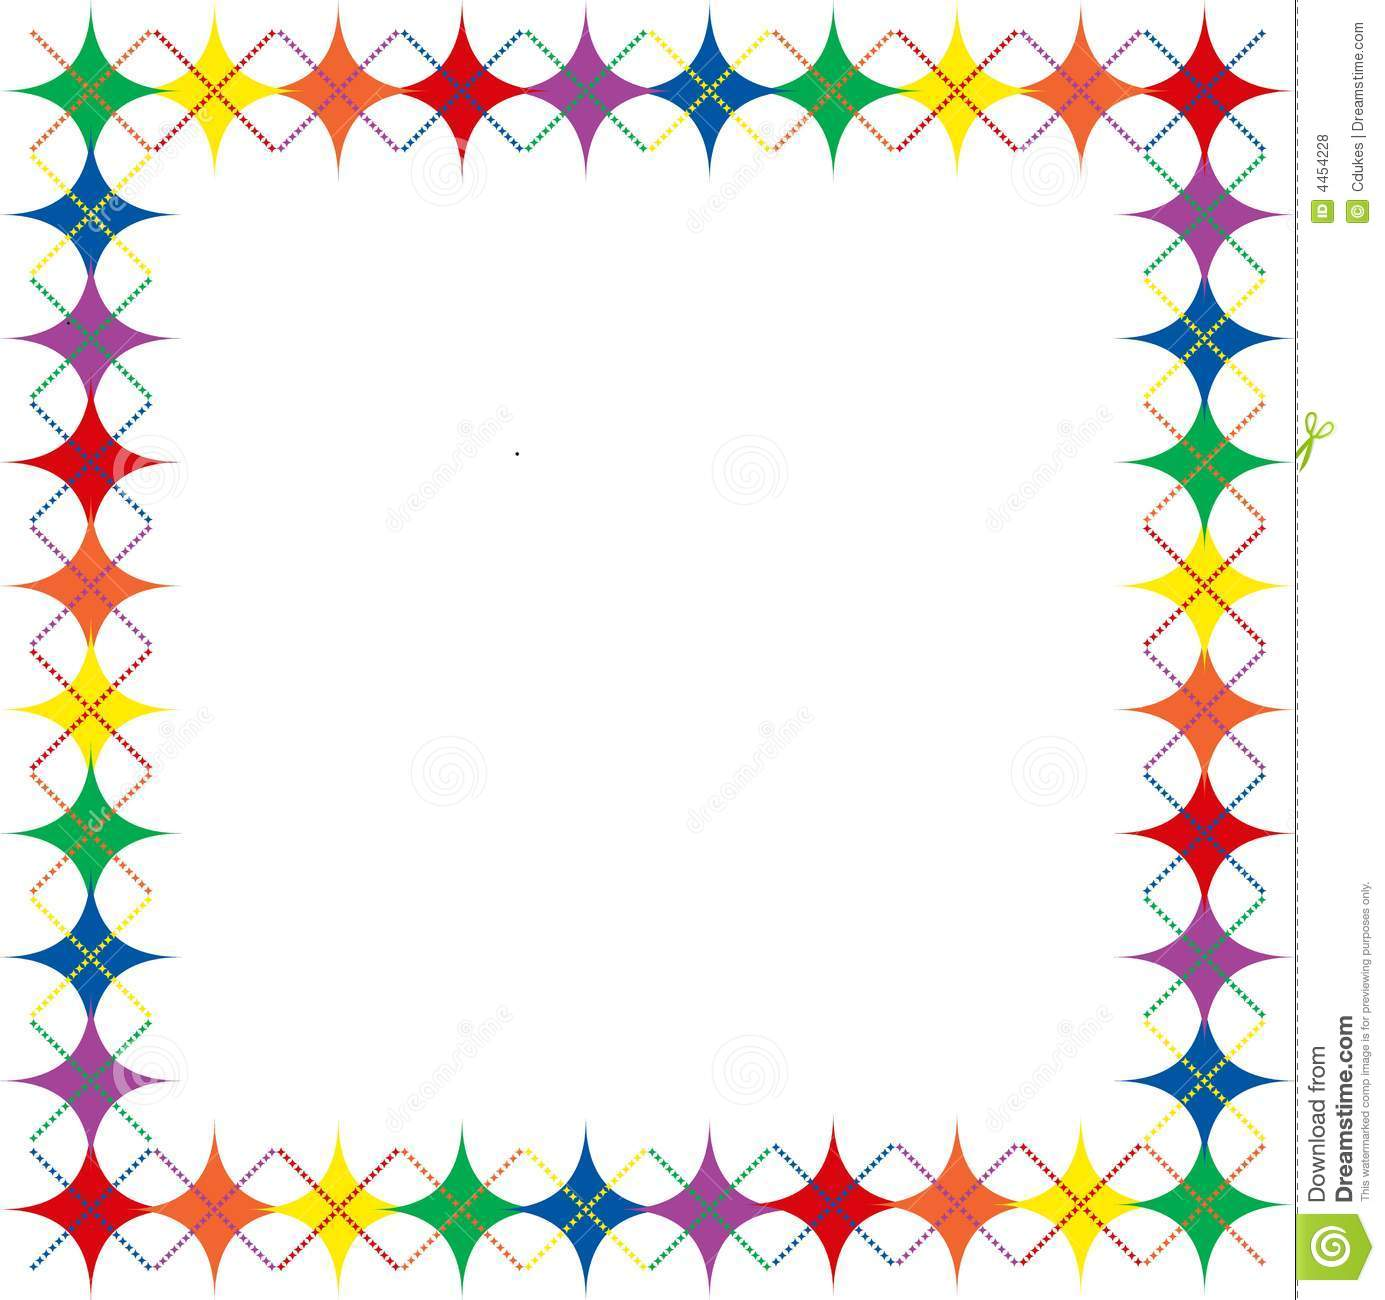 Yellow u003cbu003eStar Border Clip Art Clipartu003c/bu003e Panda Free u003cbu003eClipartu003c/bu003e Images